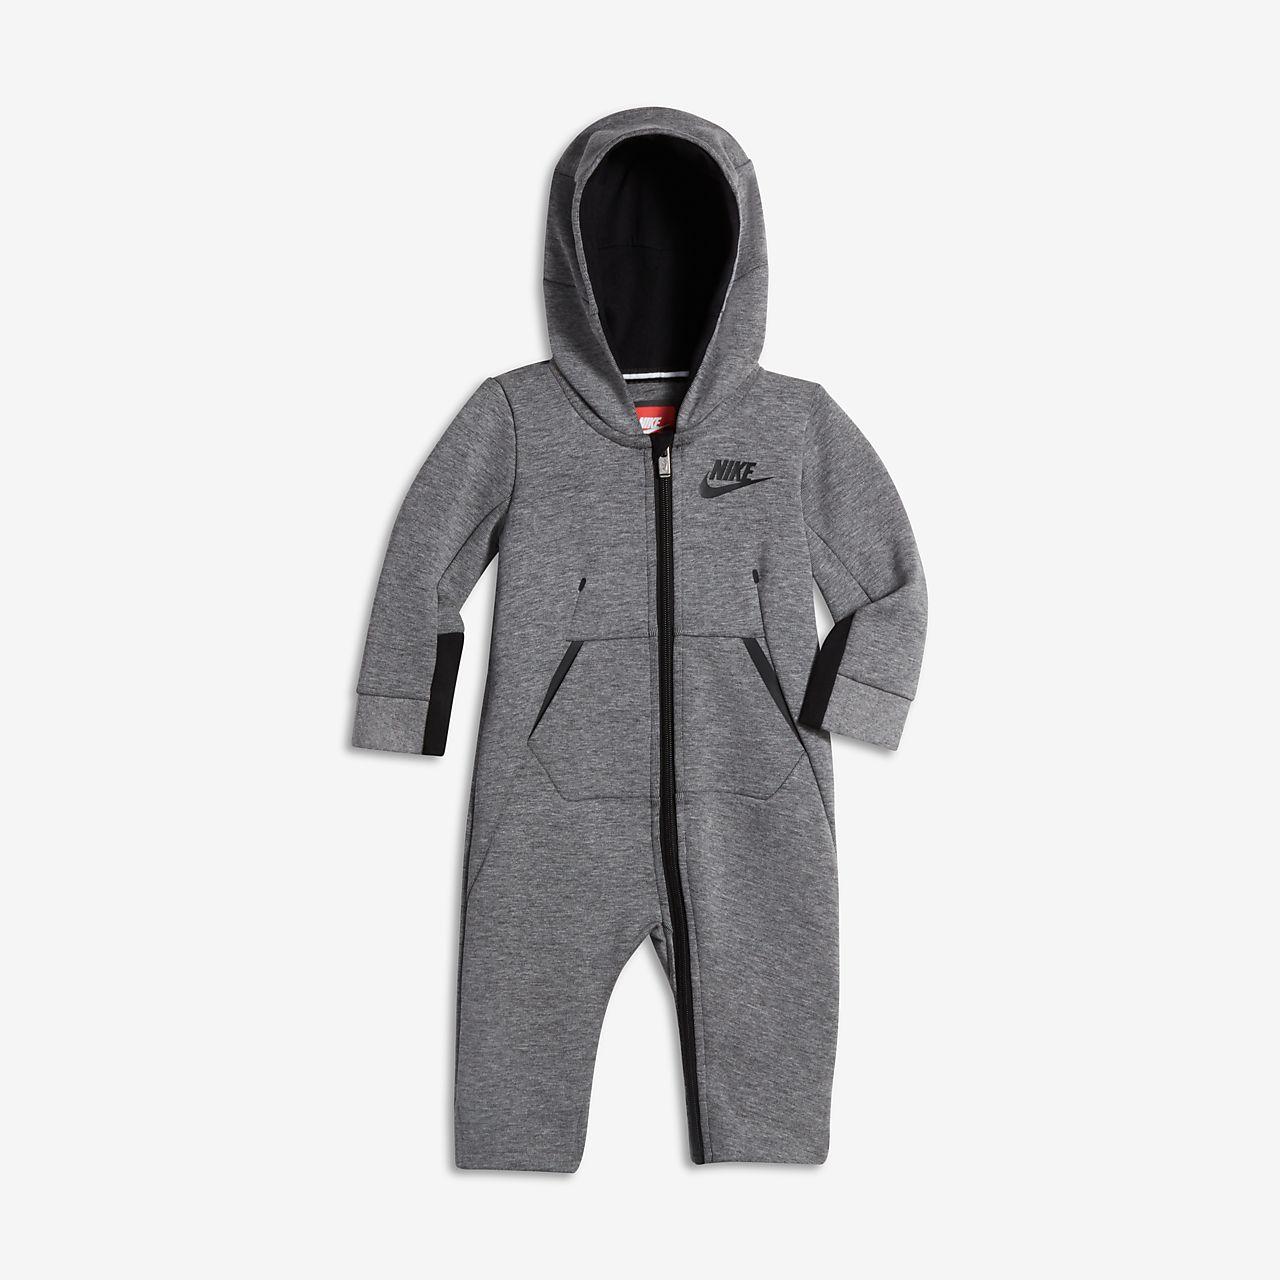 Nike Tech Fleece Infant Hooded Coverall